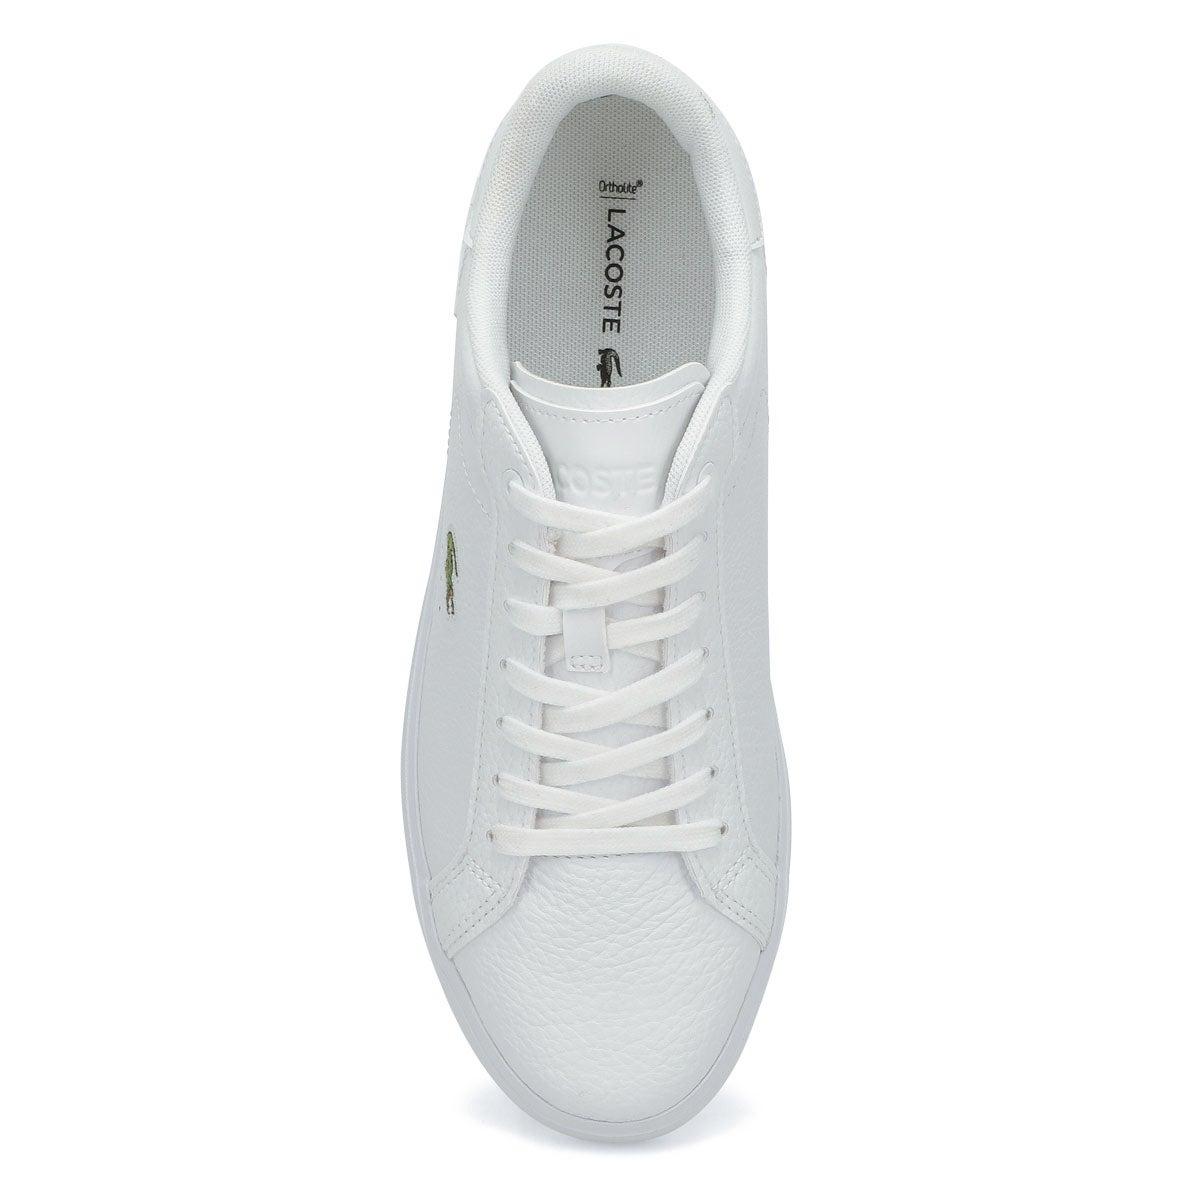 Women's Powercourt 0721 2 Sneaker - White/White